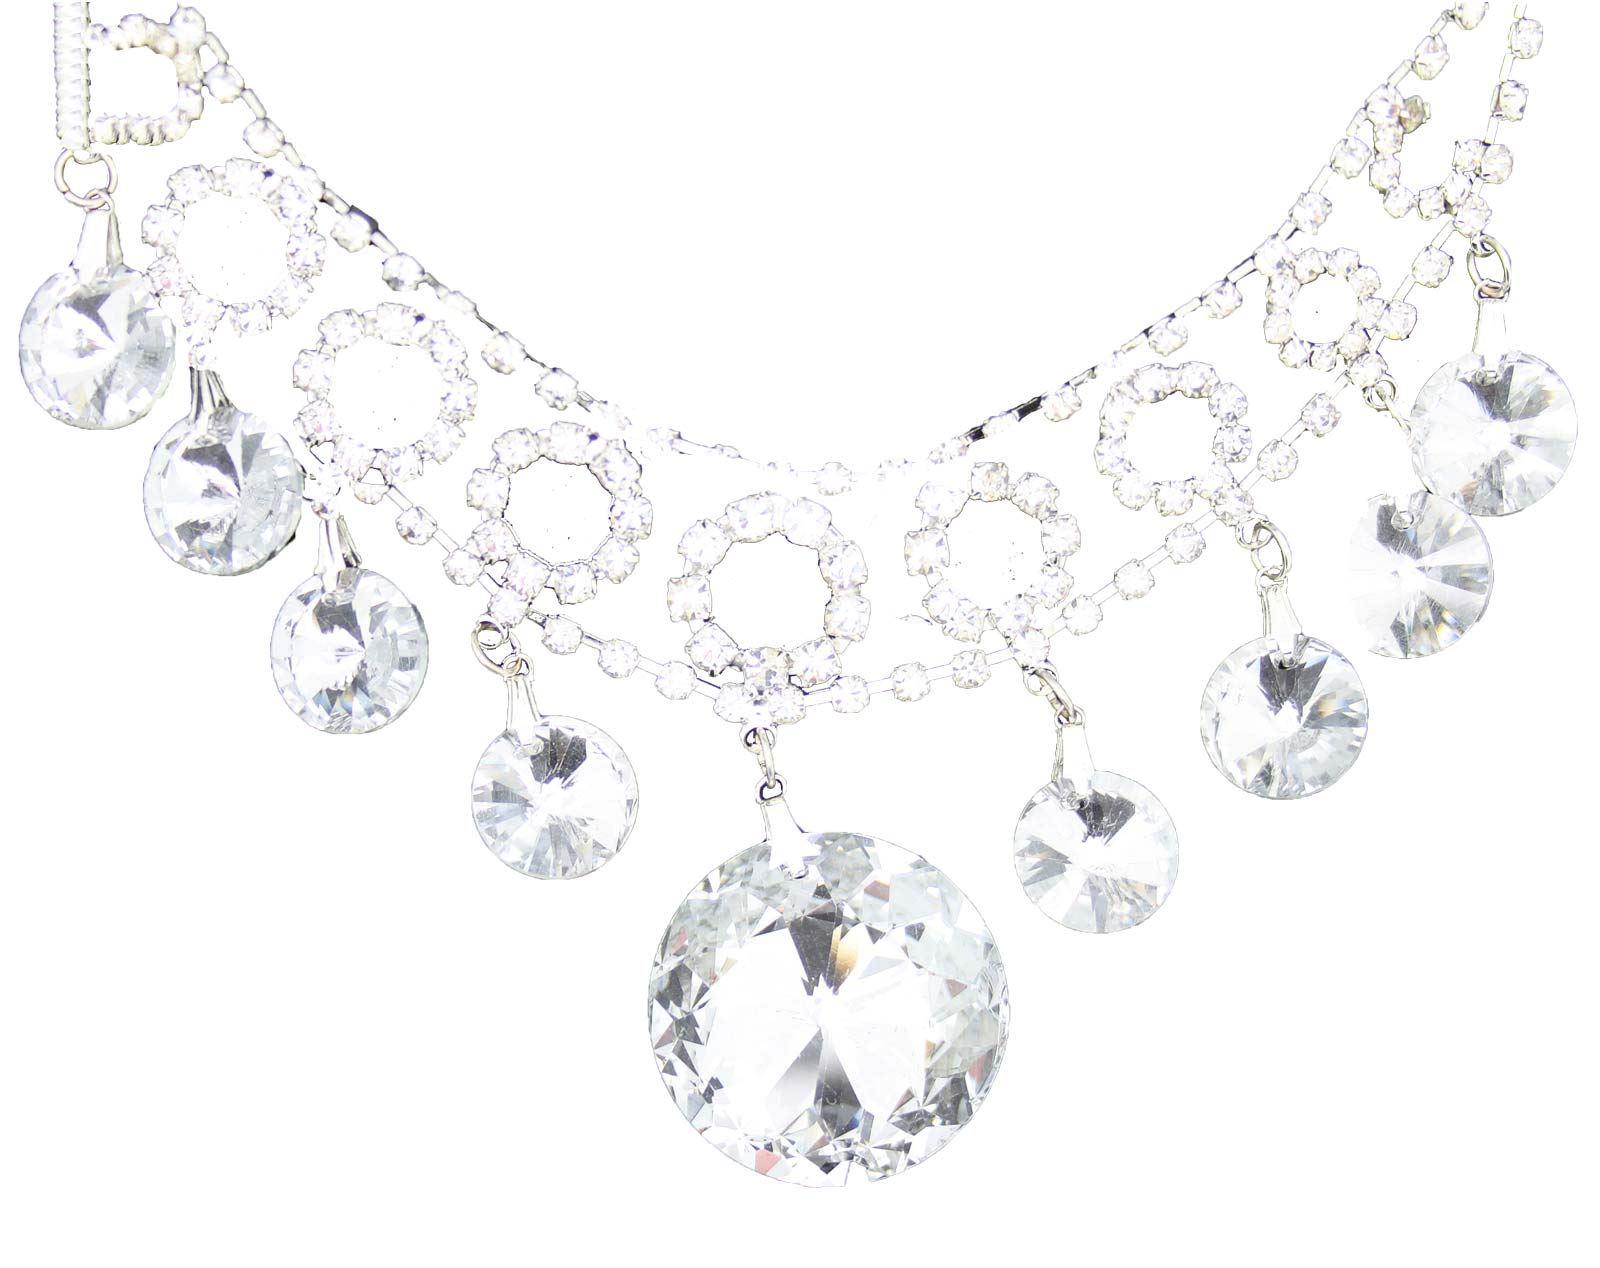 True-Face-Ladies-Women-039-s-Elegant-Earrings-Necklace-Set-Metal-Alloy-Jewellery thumbnail 16